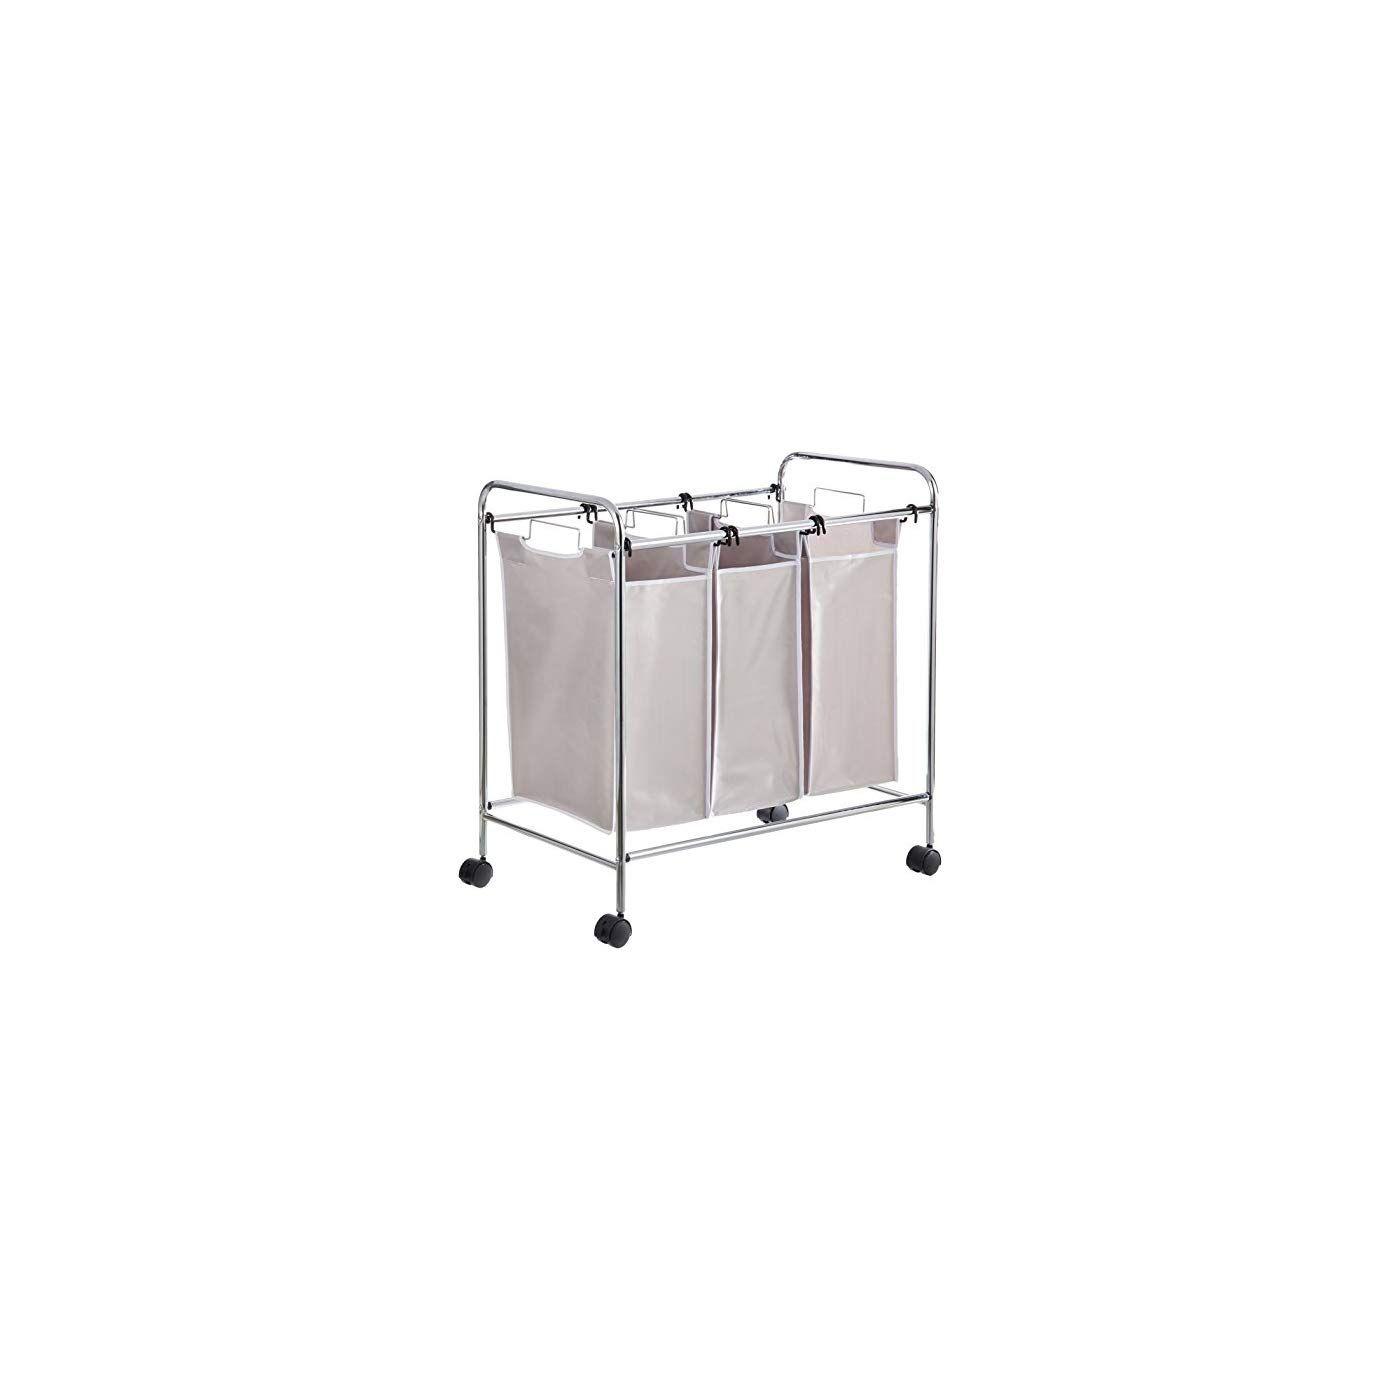 Amazonbasics 3 Bag Laundry Hamper Sorter Basket Laundry Hamper